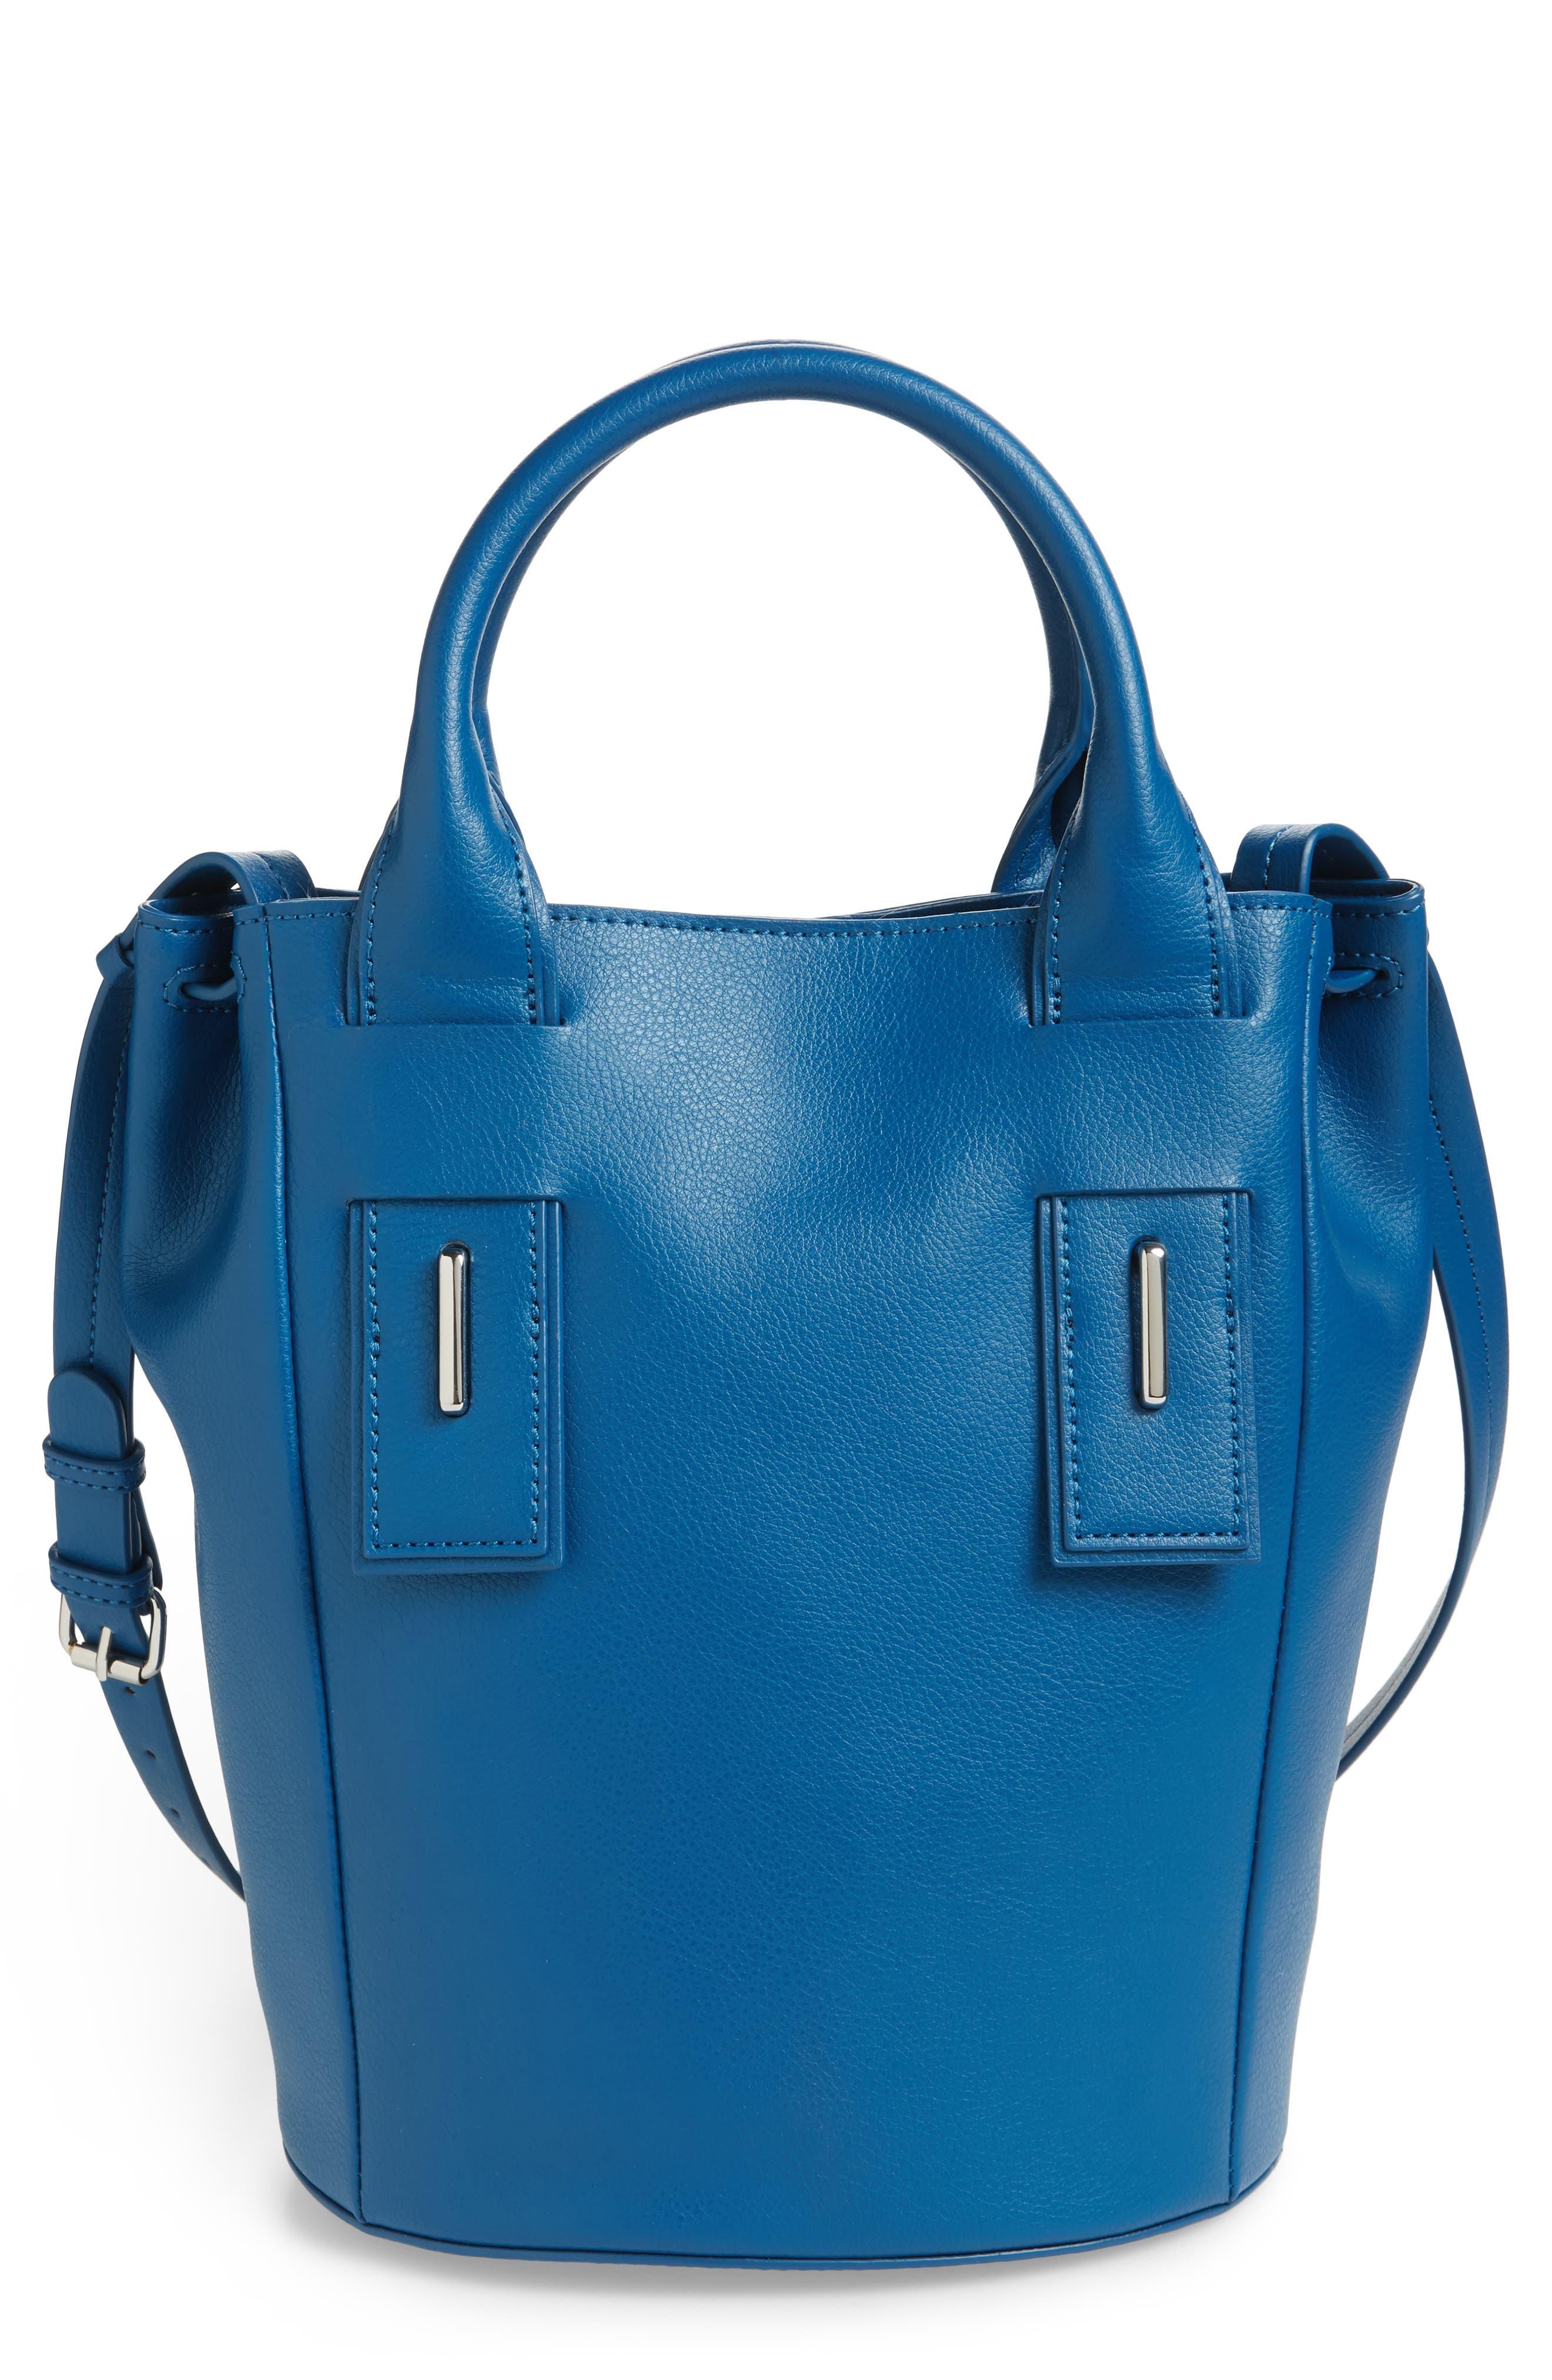 Lennon Leather Bucket Bag,                             Main thumbnail 1, color,                             400